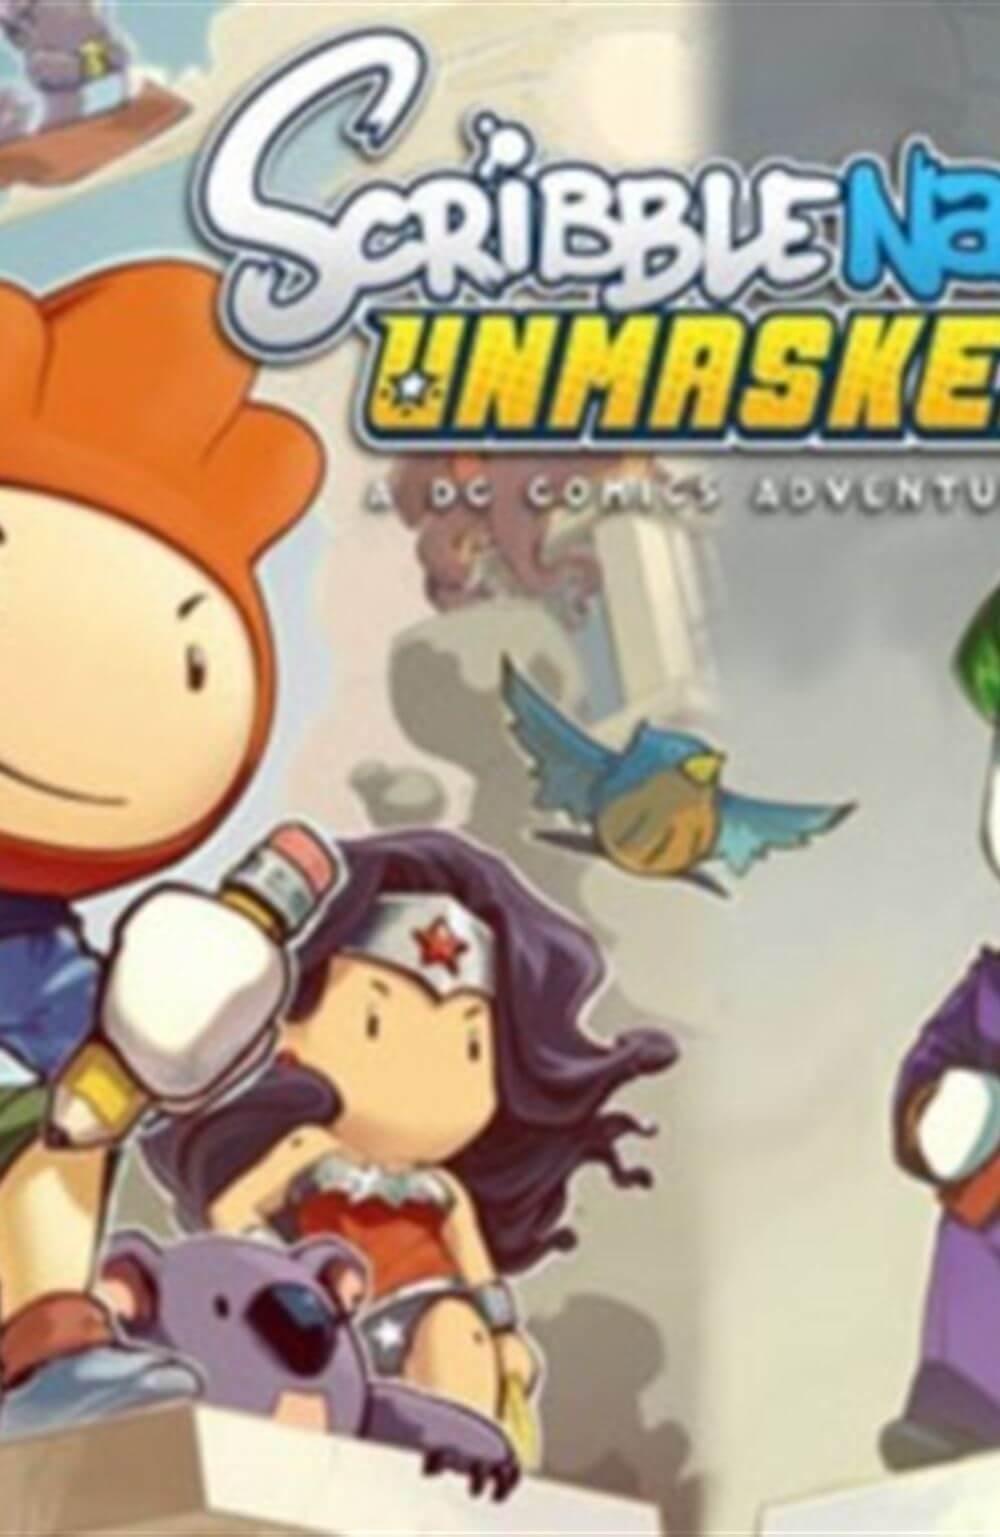 Scribblenauts Unmasked : A DC Comics Adventure (WW)